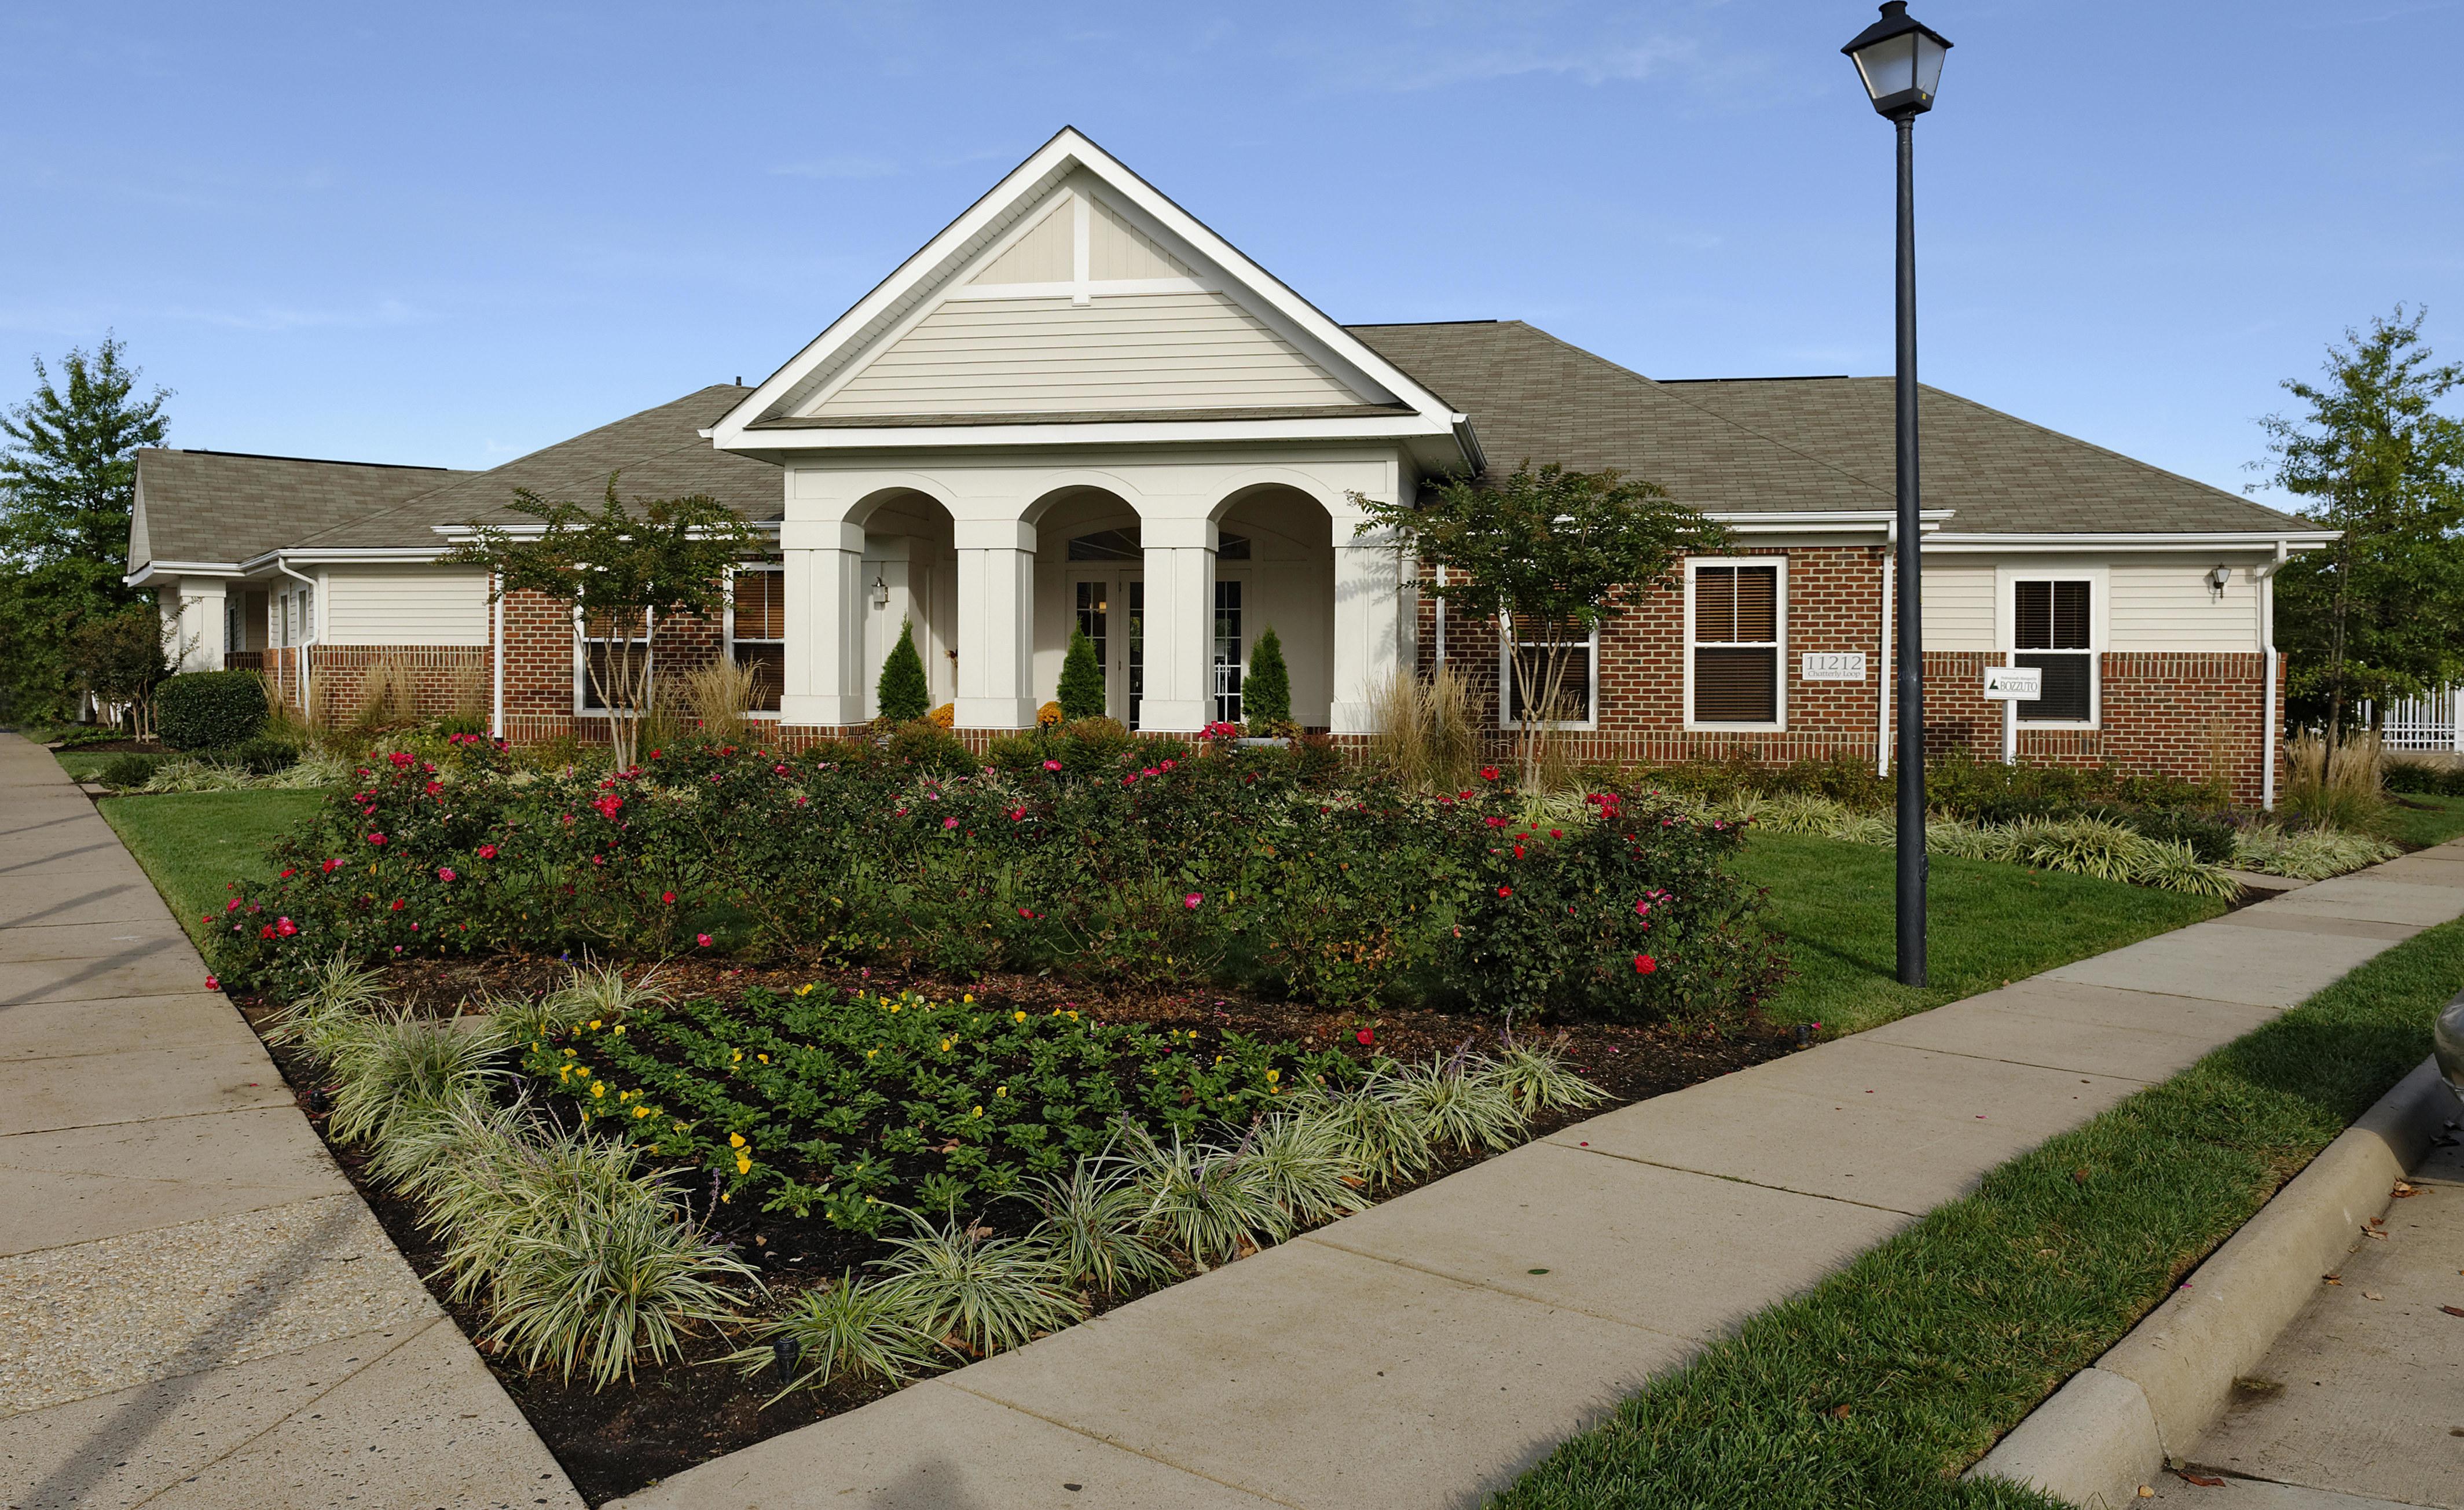 20 Best Apartments In Manassas, VA (with pictures)!